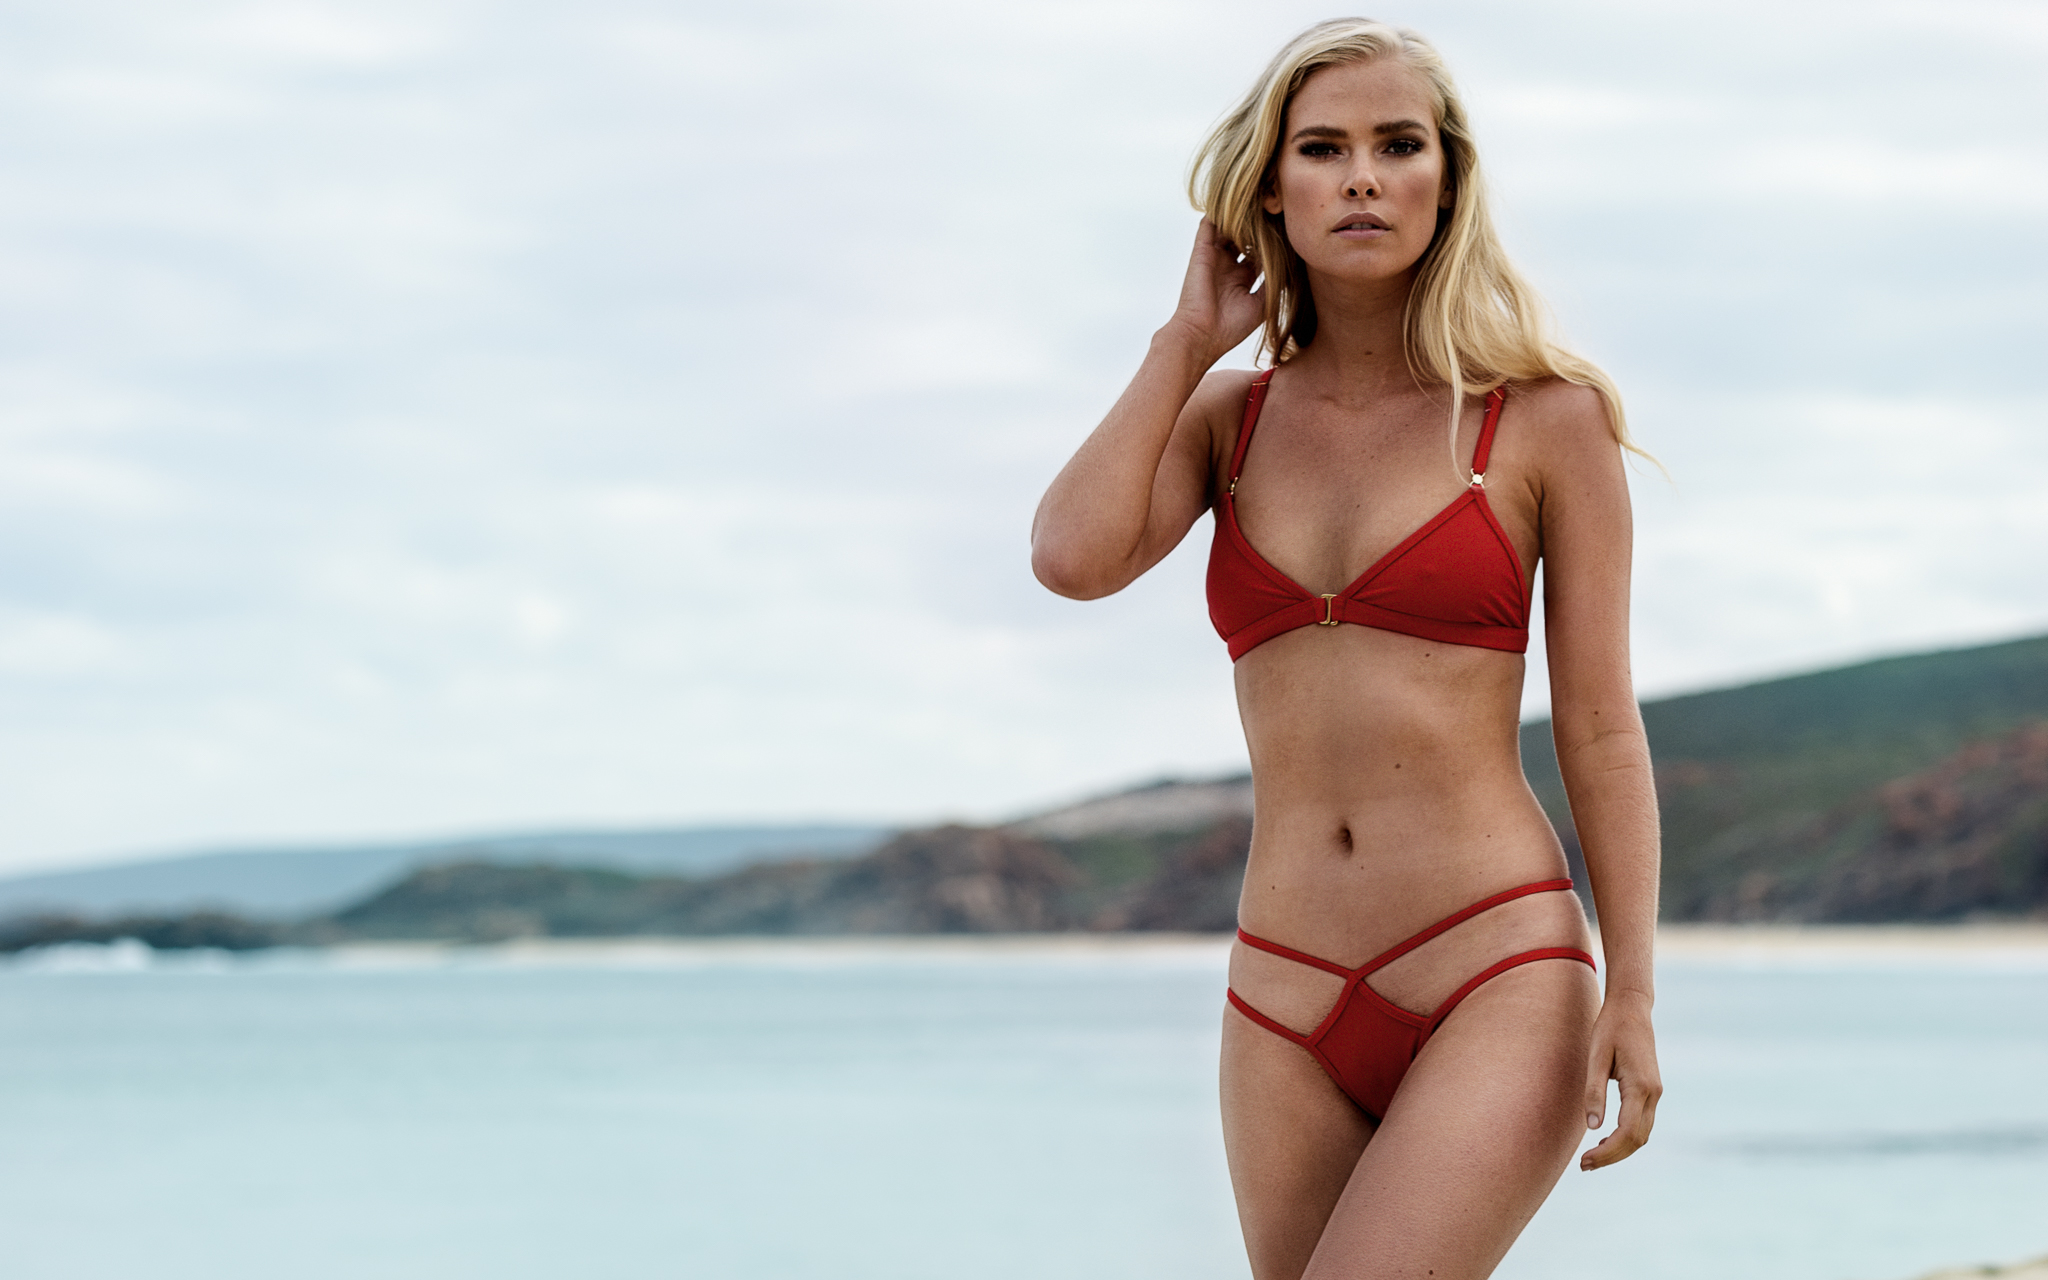 Millicent Lambert model with Dave Blake Photographer - daveblake